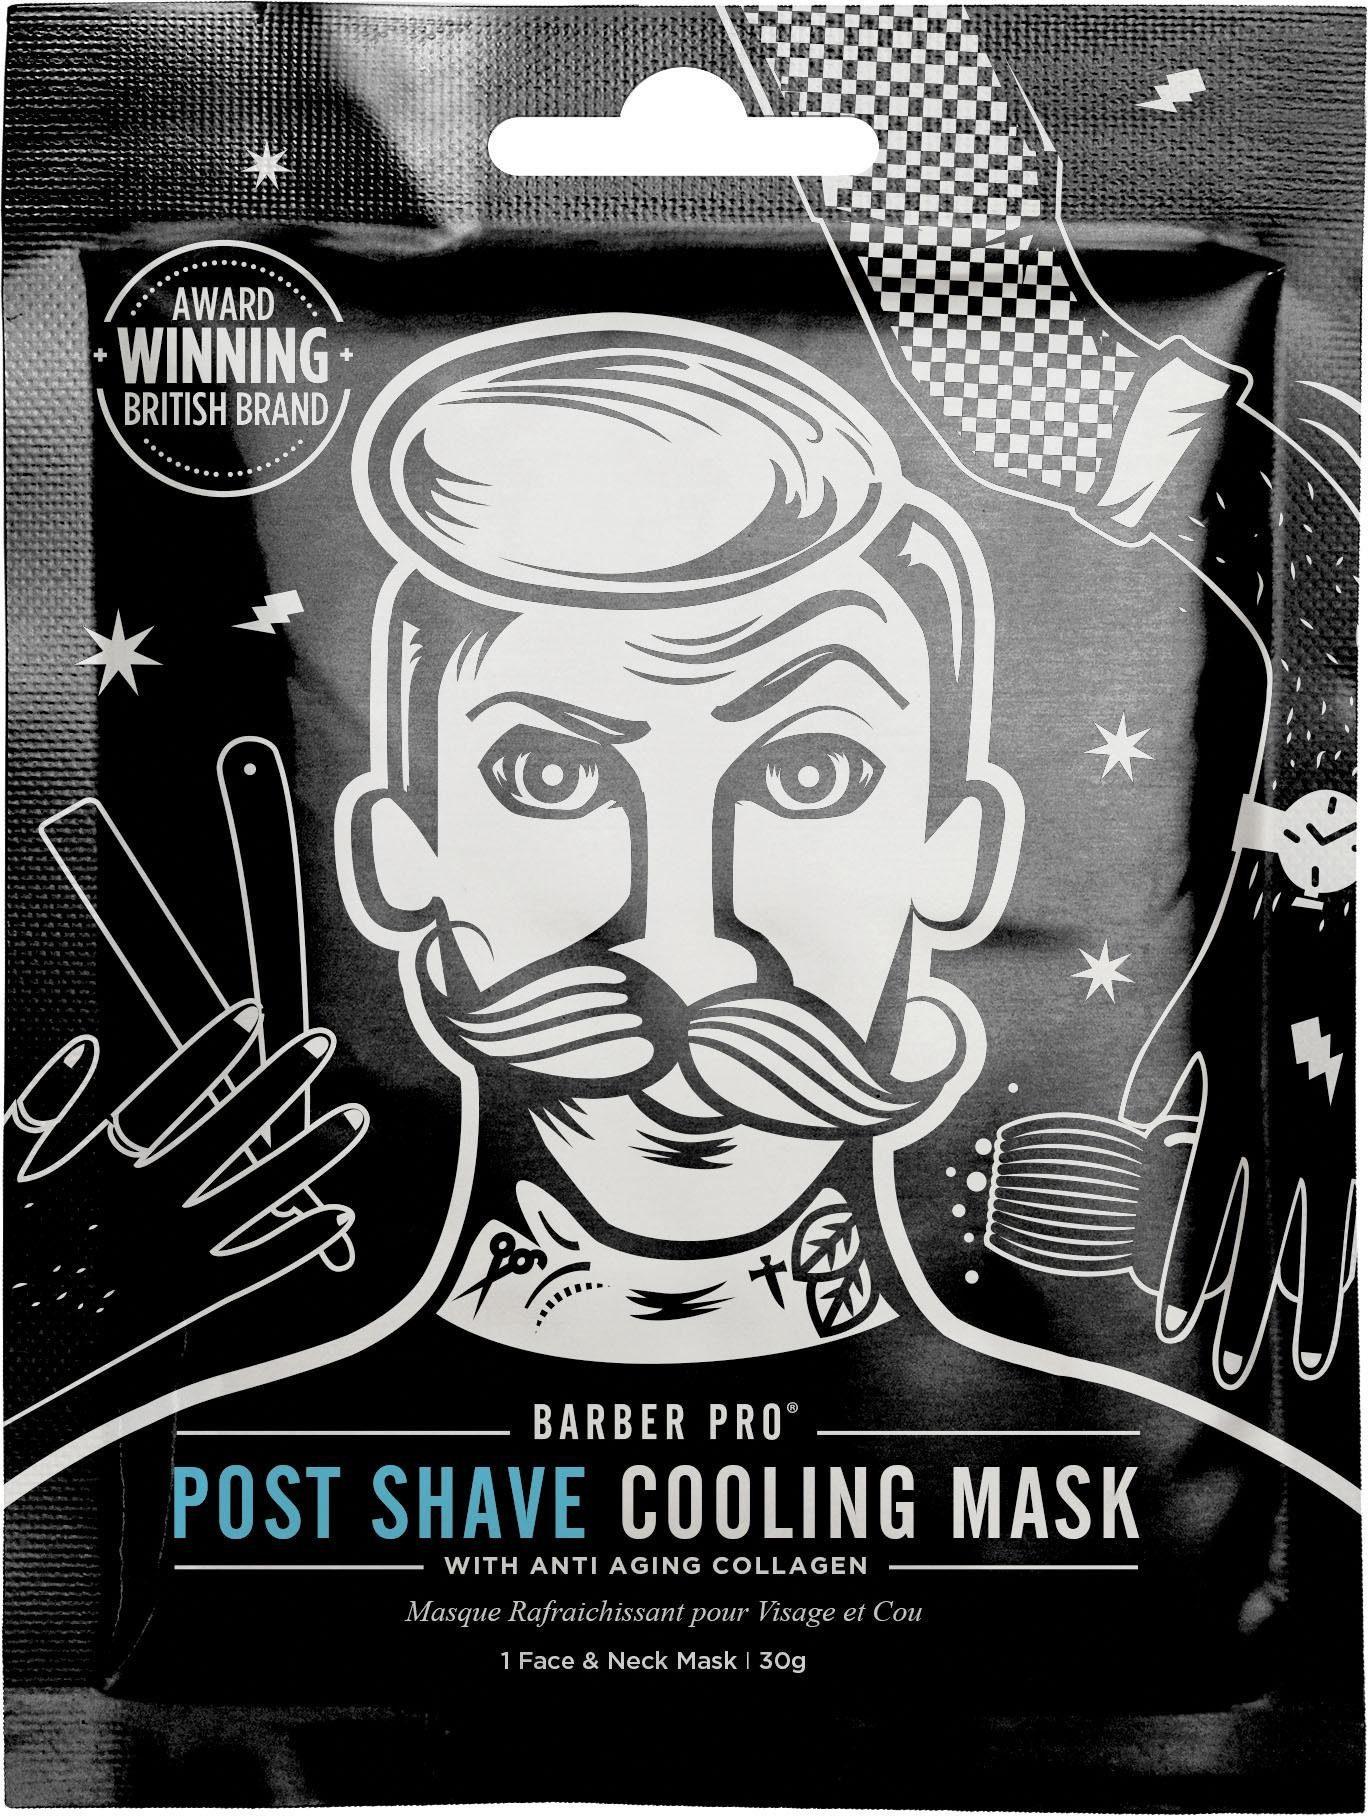 BARBER PRO, »Post Shave Cooling Mask™«, Vliesmaske mit anti-aging Kollagen